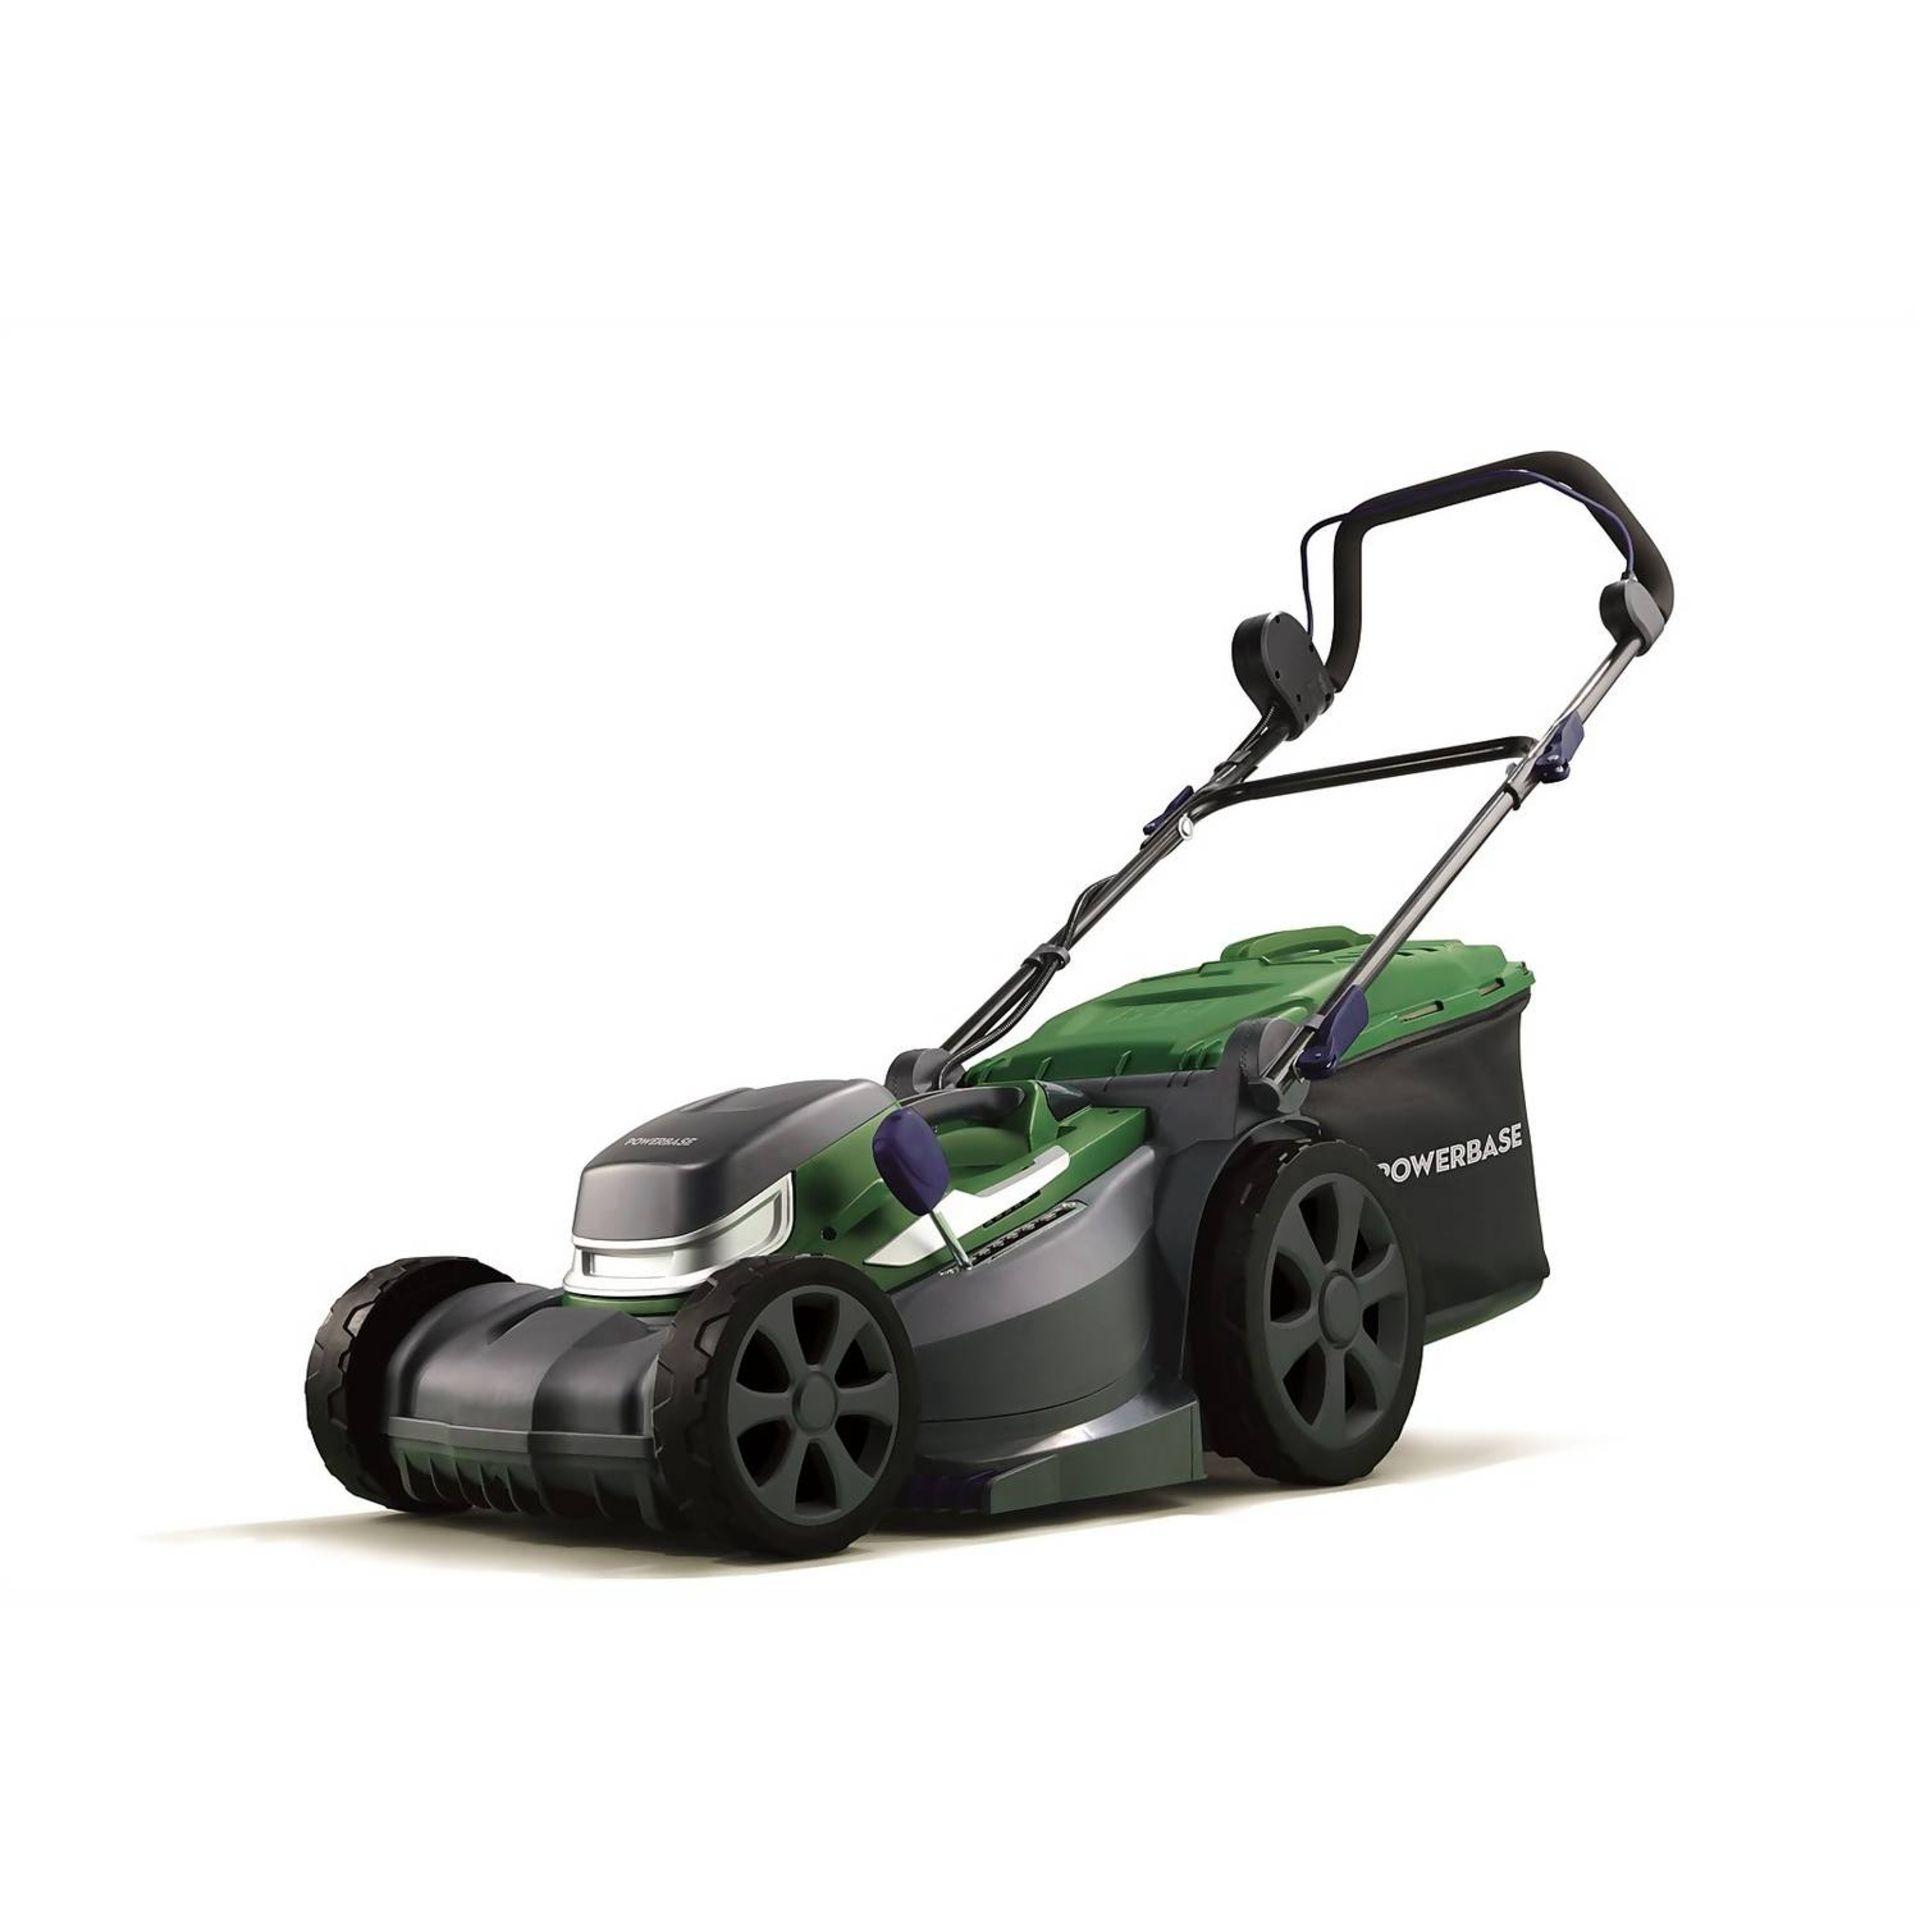 (P3) 1x Powerbase 37cm 40V Cordless Lawn Mower. RRP £199.00. Unit Appears Clean, As new & Unused. L